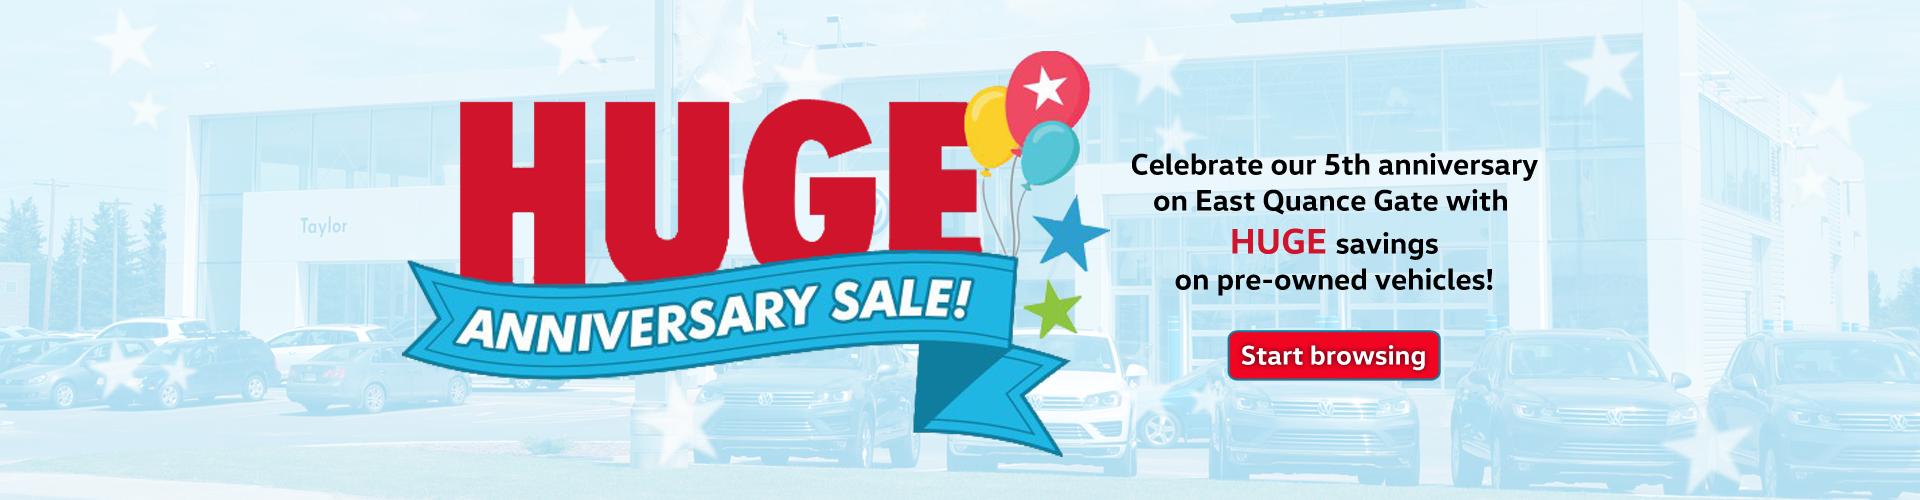 HUGE Anniversary Sale